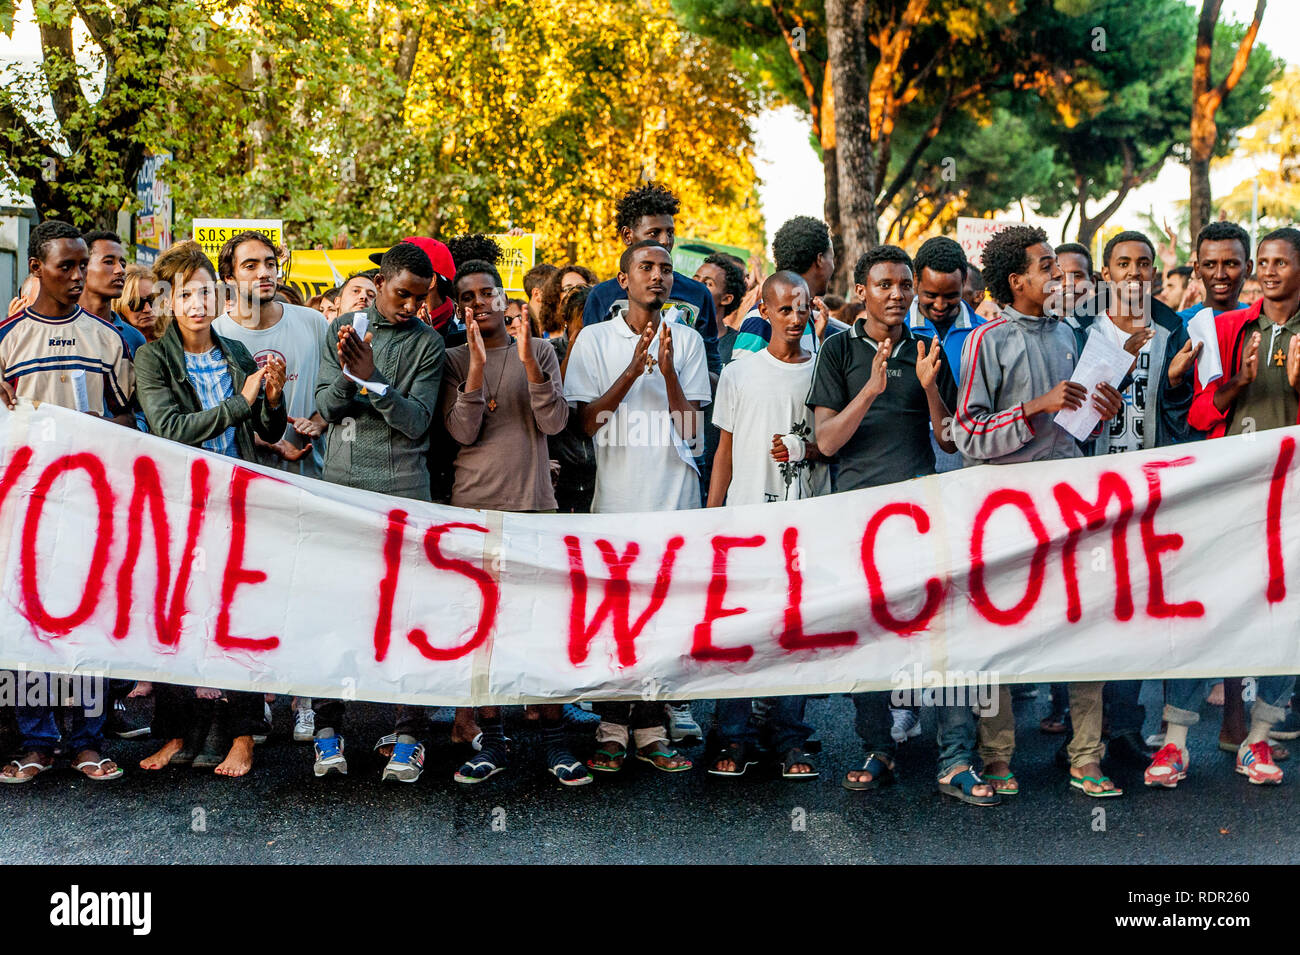 Roma, Italia - 20 giugno 2018: africano i migranti e i rifugiati ...